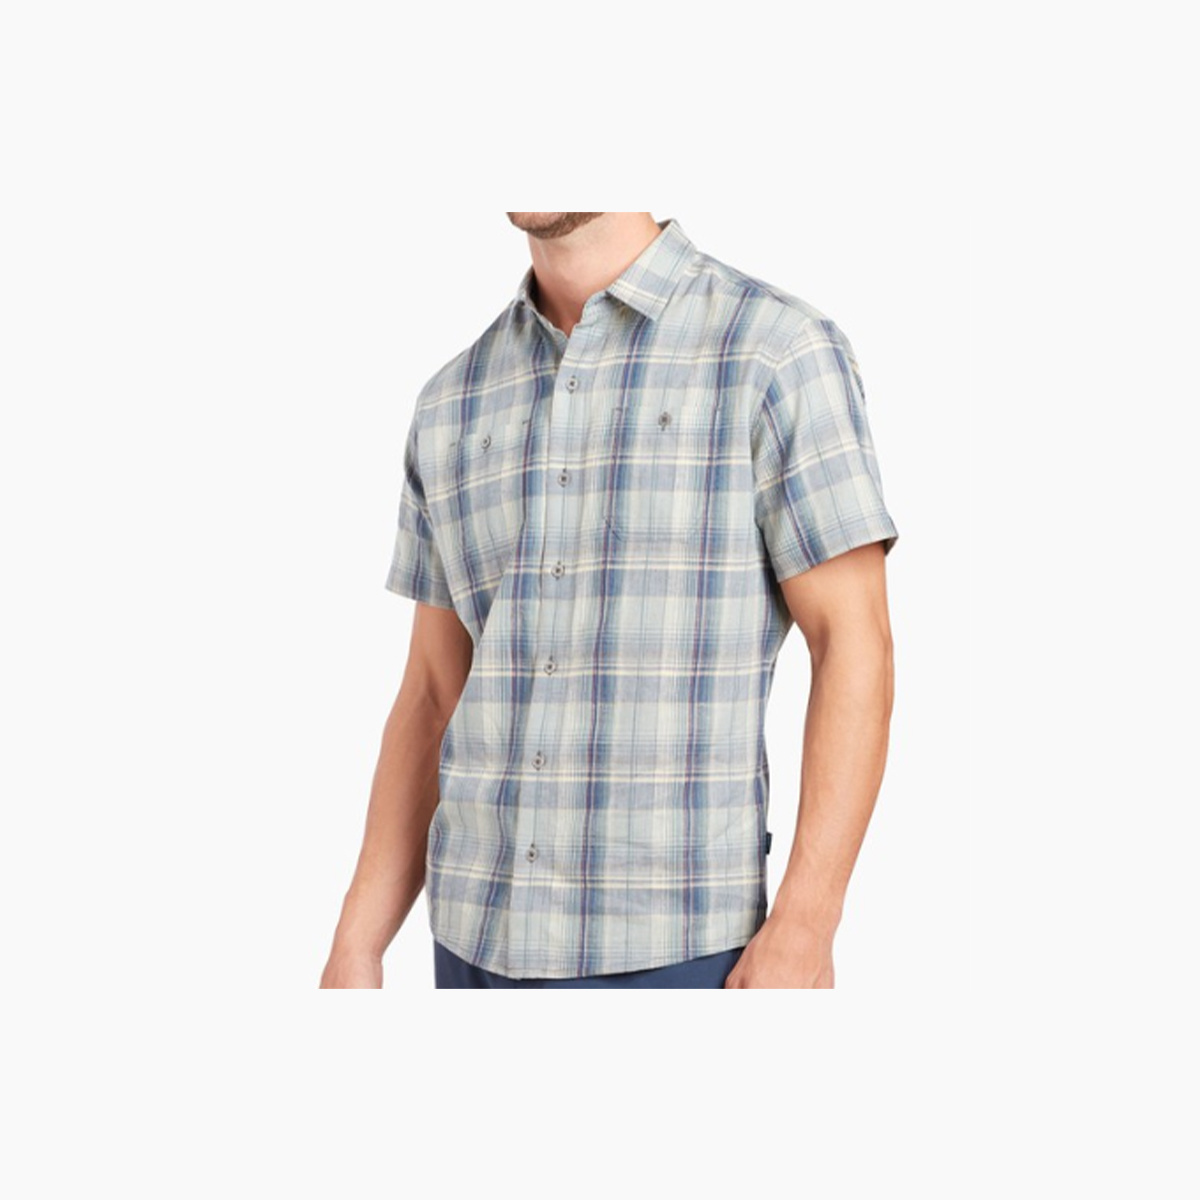 Kuhl Men's Skorpio Short Sleeve